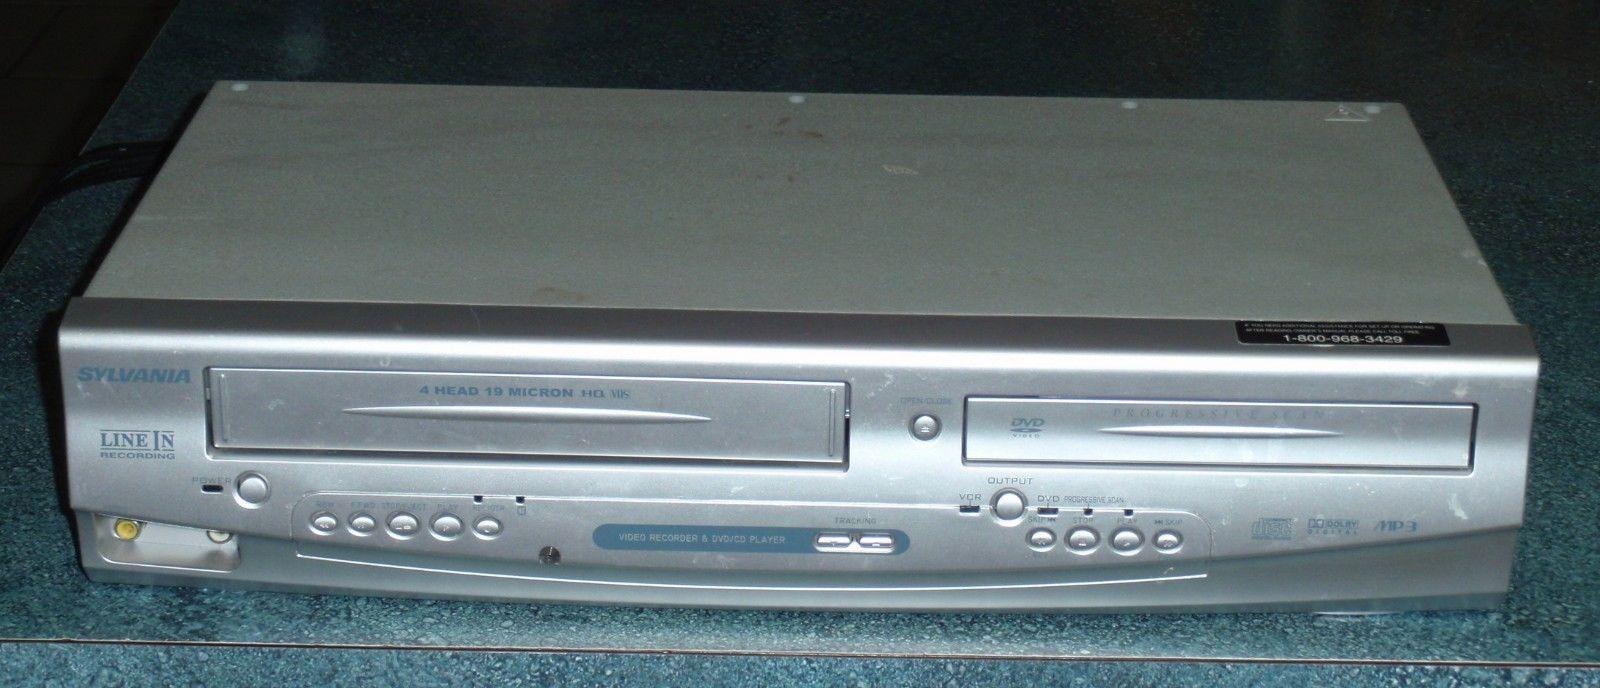 Sylvania DV220SL8 Dvd PLAYER/ Vhs Video and similar items